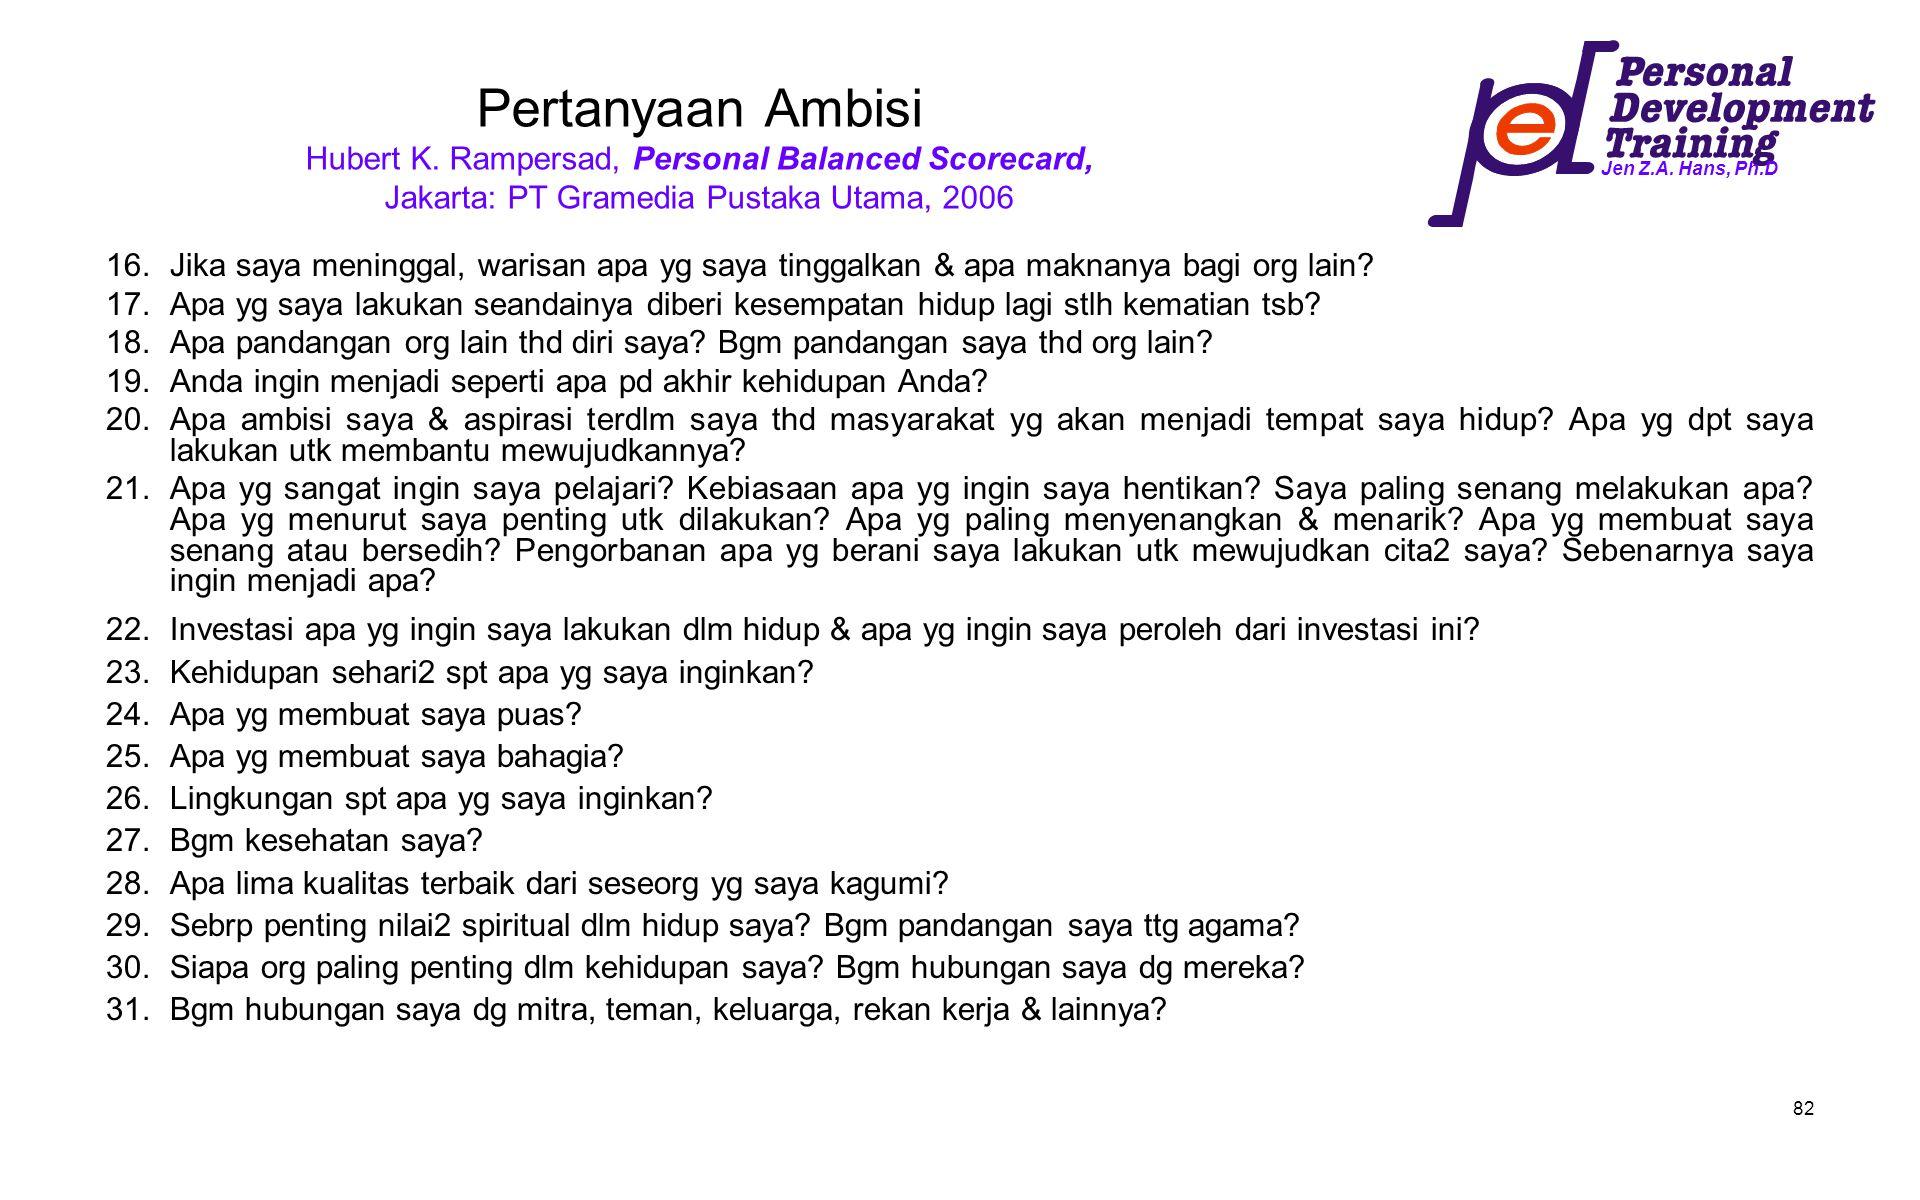 Jen Z.A. Hans, Ph.D 82 Pertanyaan Ambisi Hubert K. Rampersad, Personal Balanced Scorecard, Jakarta: PT Gramedia Pustaka Utama, 2006 16.Jika saya menin